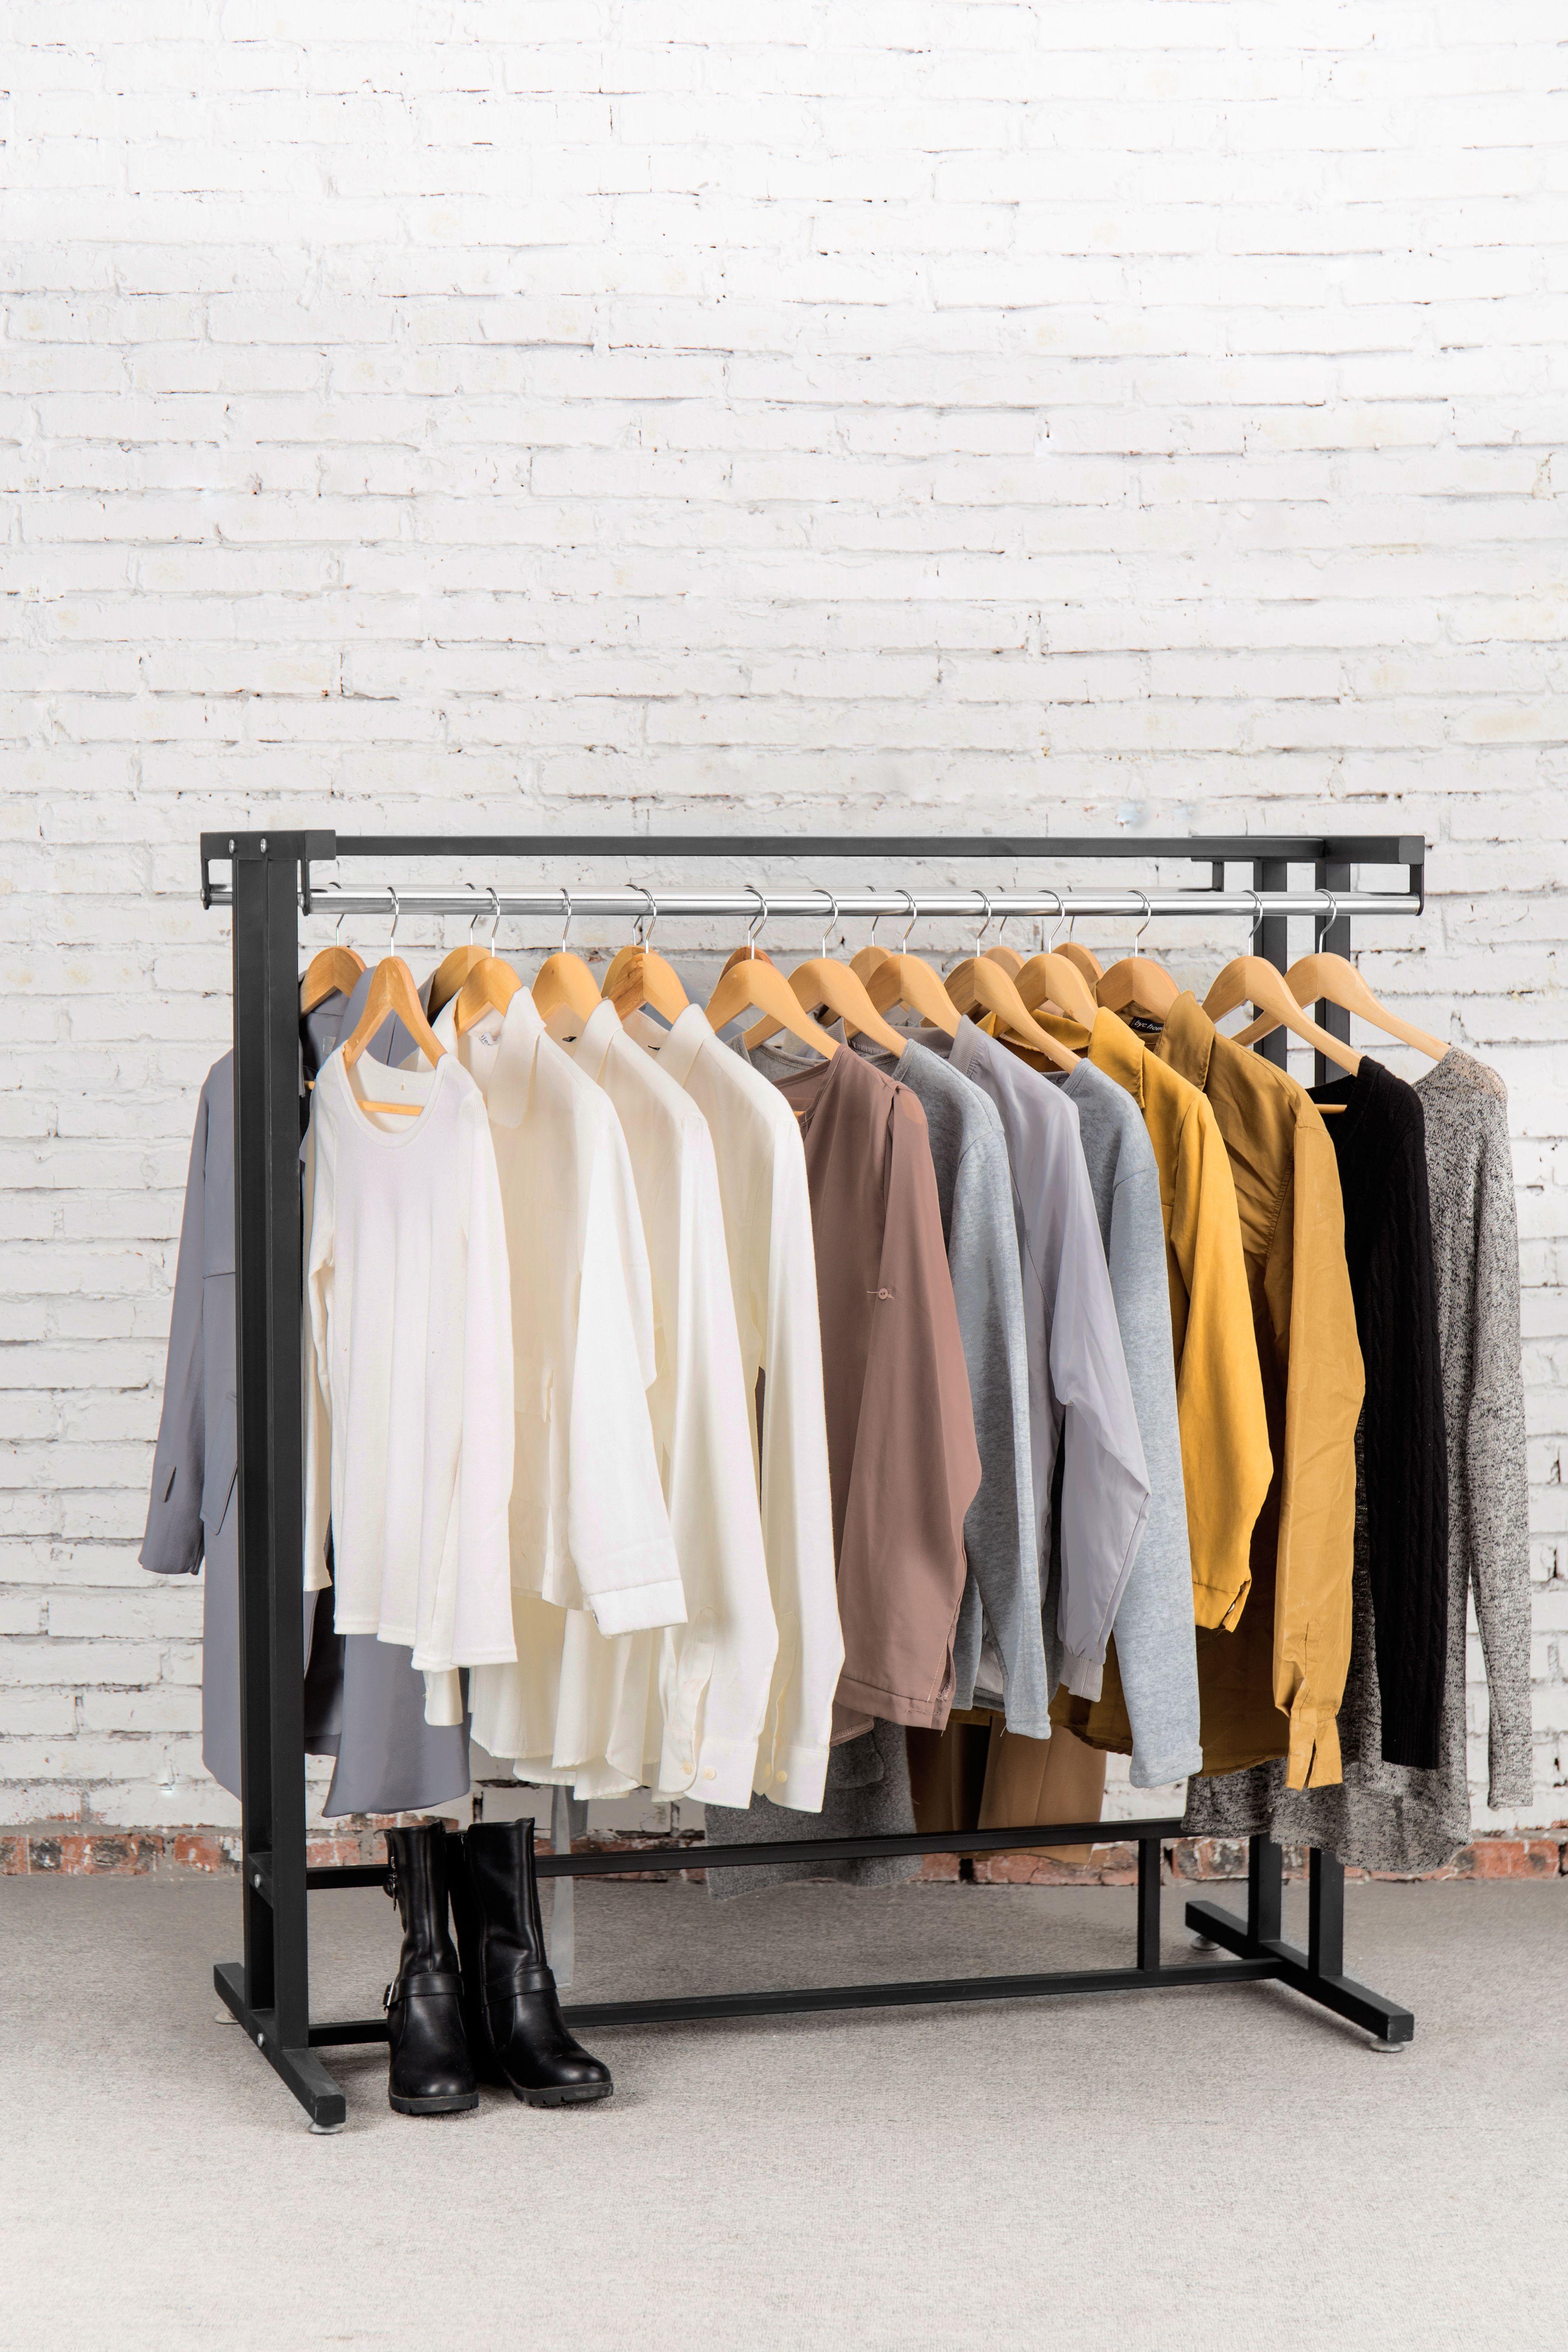 Industrial strength wardrobe garment rack. Retail style clothing